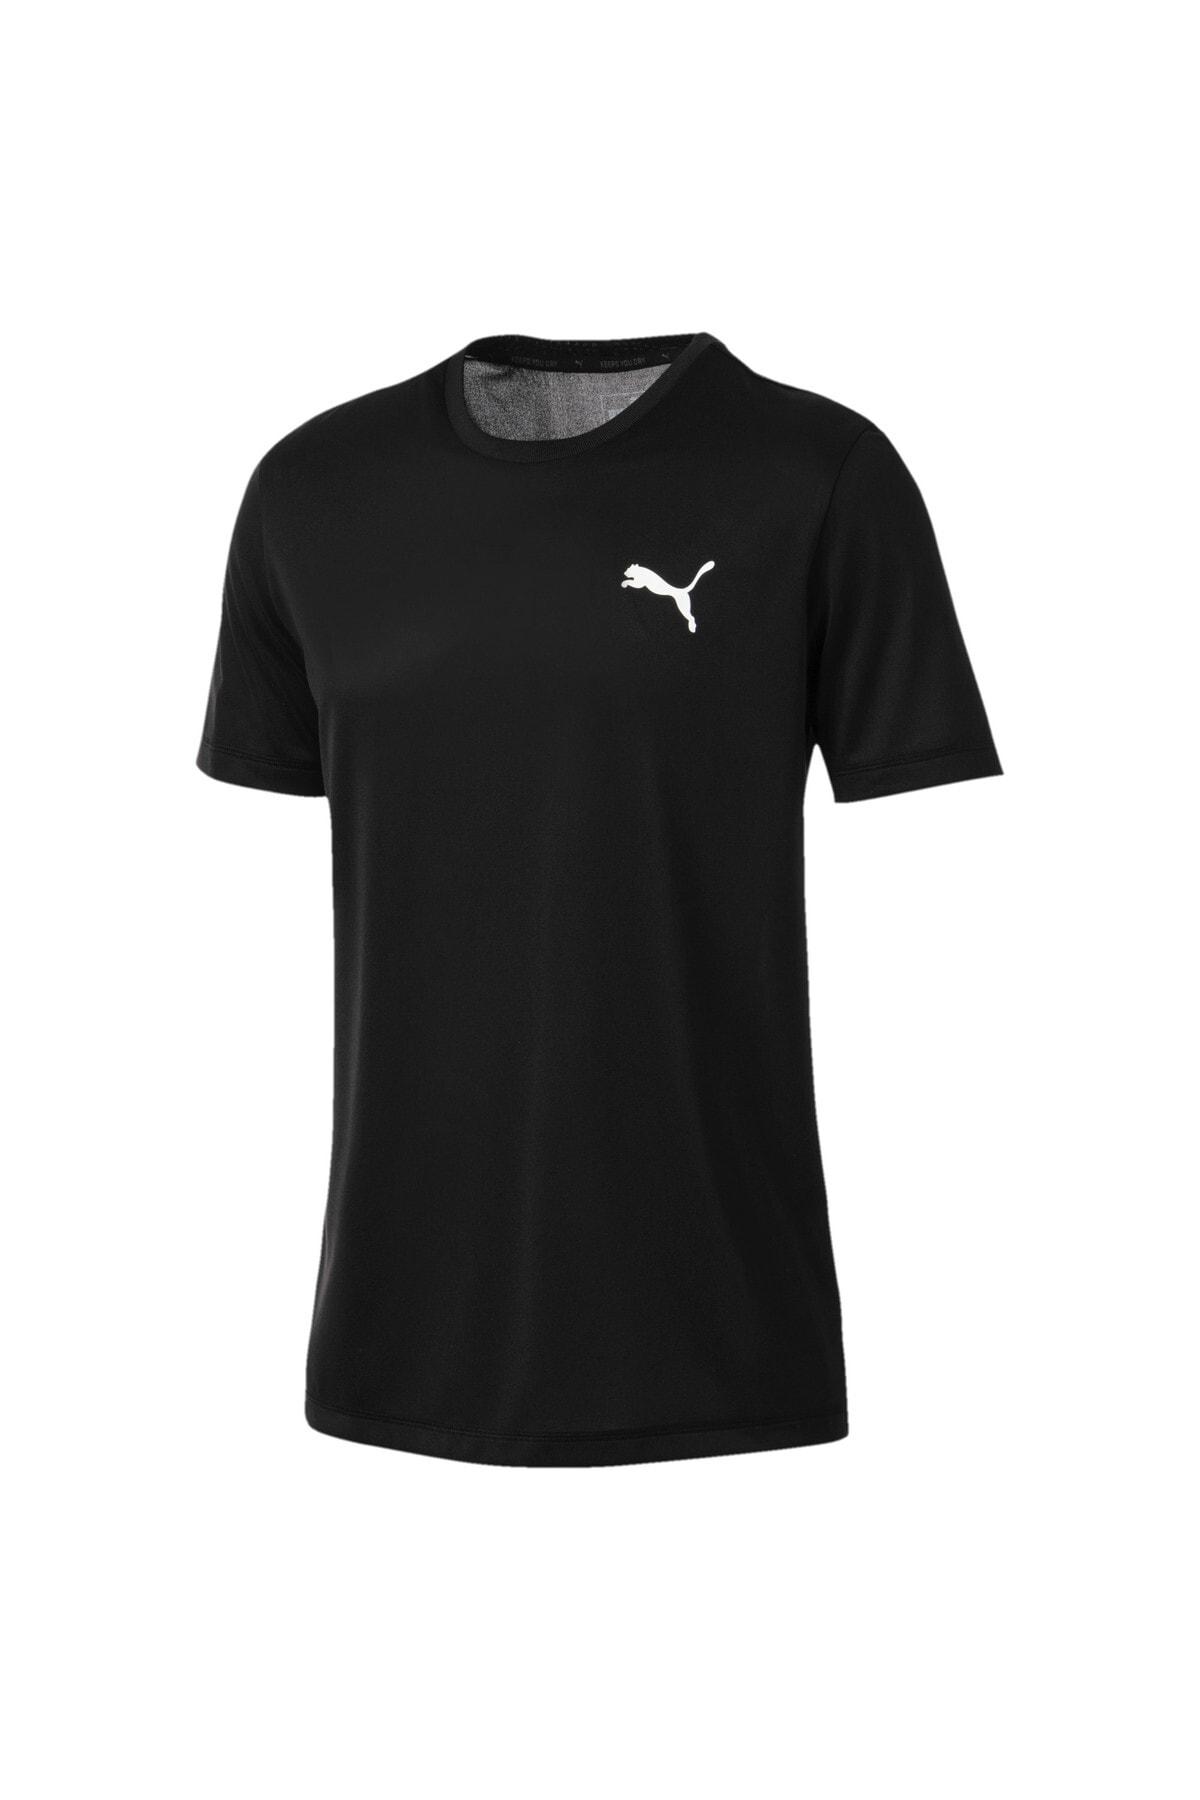 Puma Erkek T-shirt - Active Tee - 85170201 1